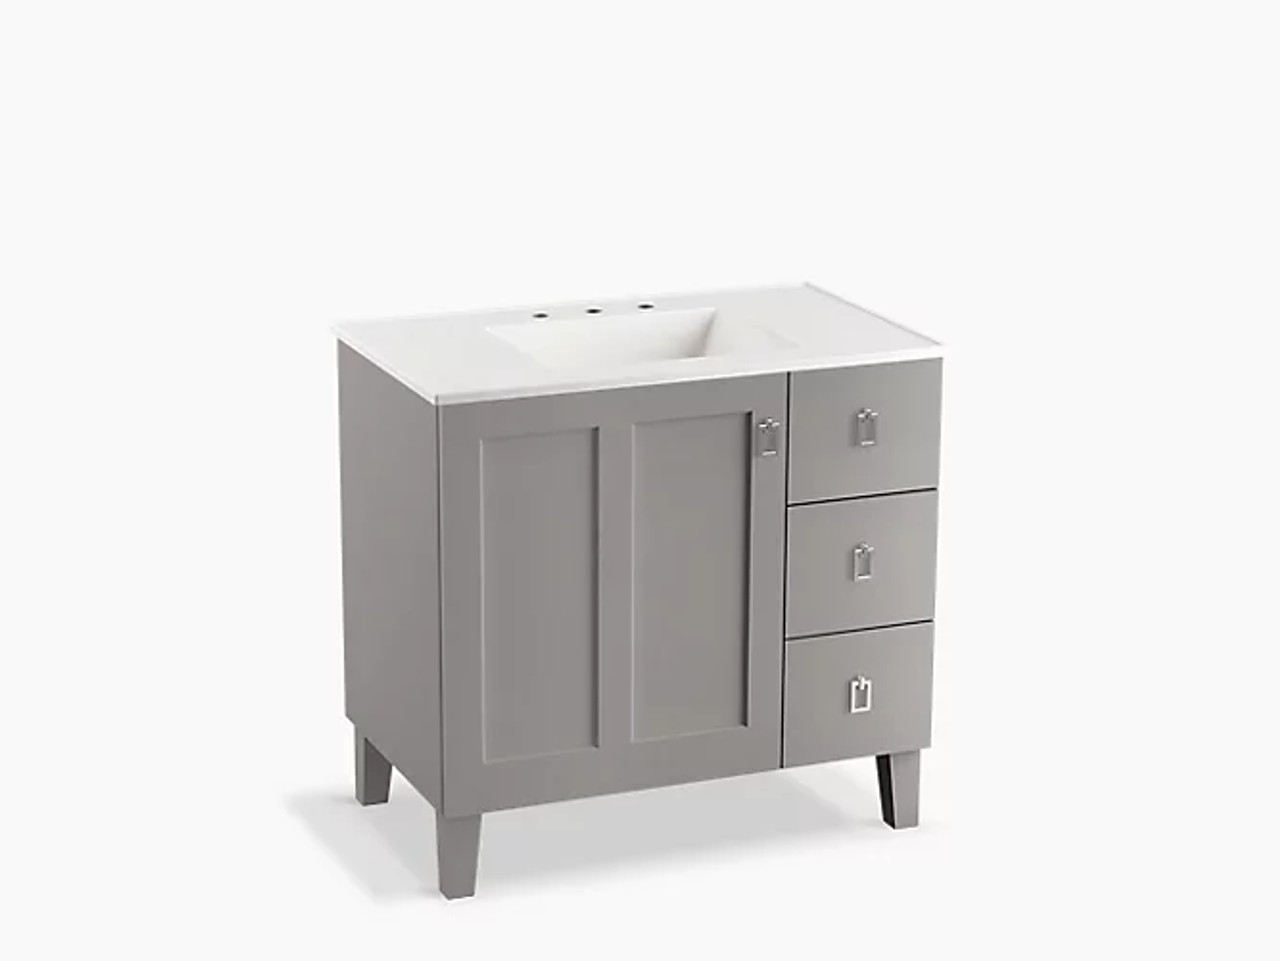 Kohler Poplin 36 Bathroom Vanity Cabinet With Legs 1 Door And 3 Drawers On Right Inmohair Grey Royal Bath Place